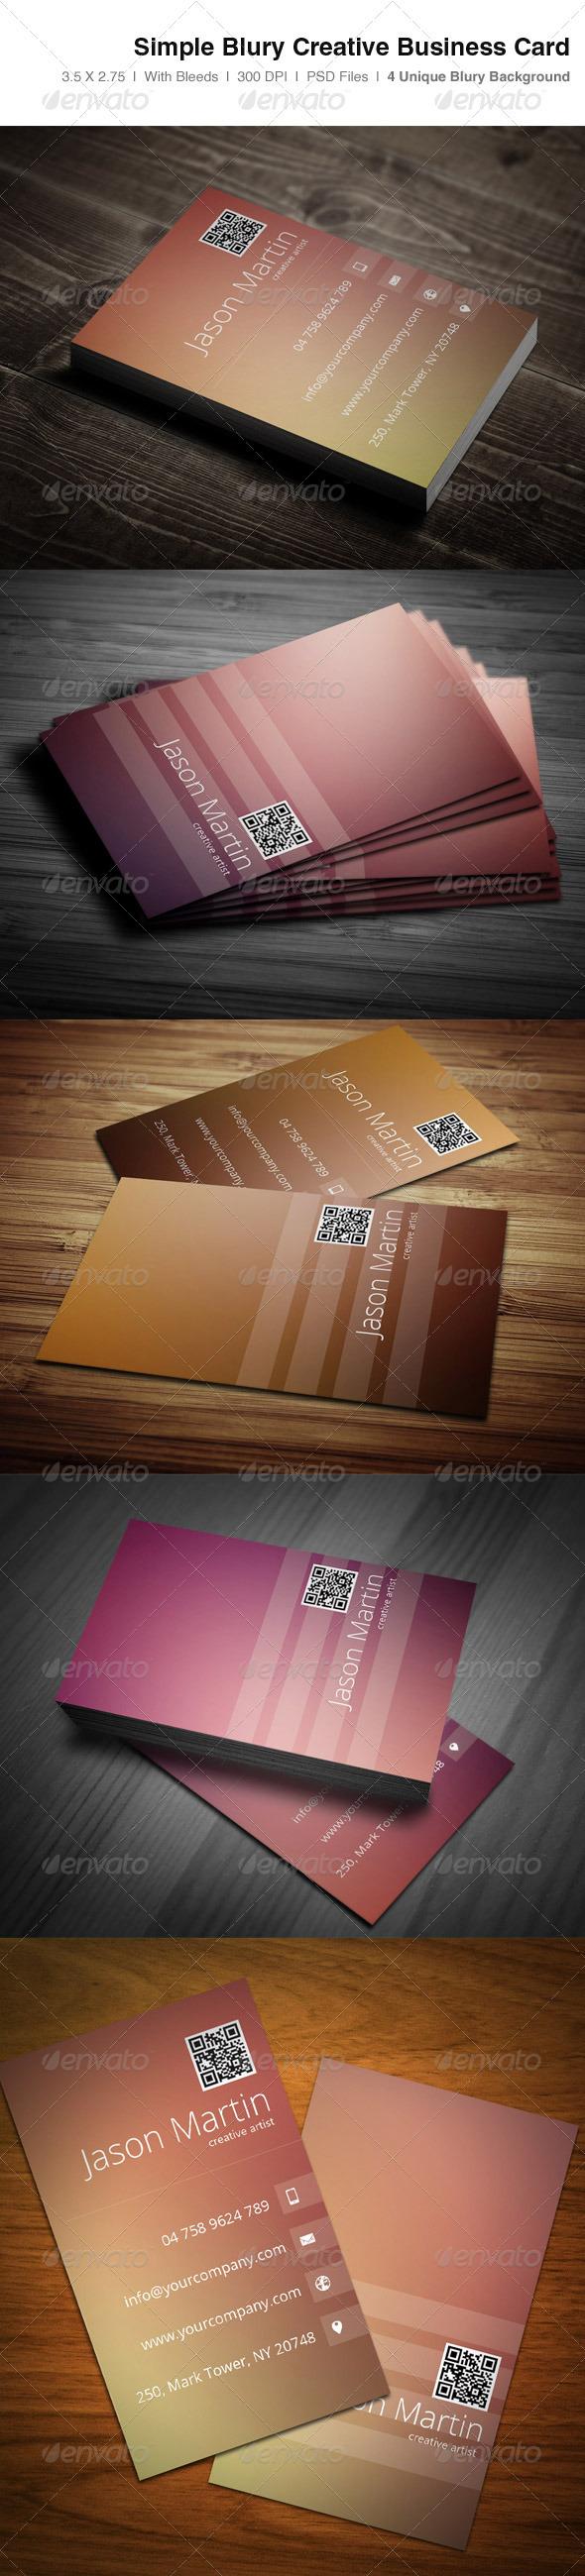 Simple Blury Creative Business Card - Creative Business Cards